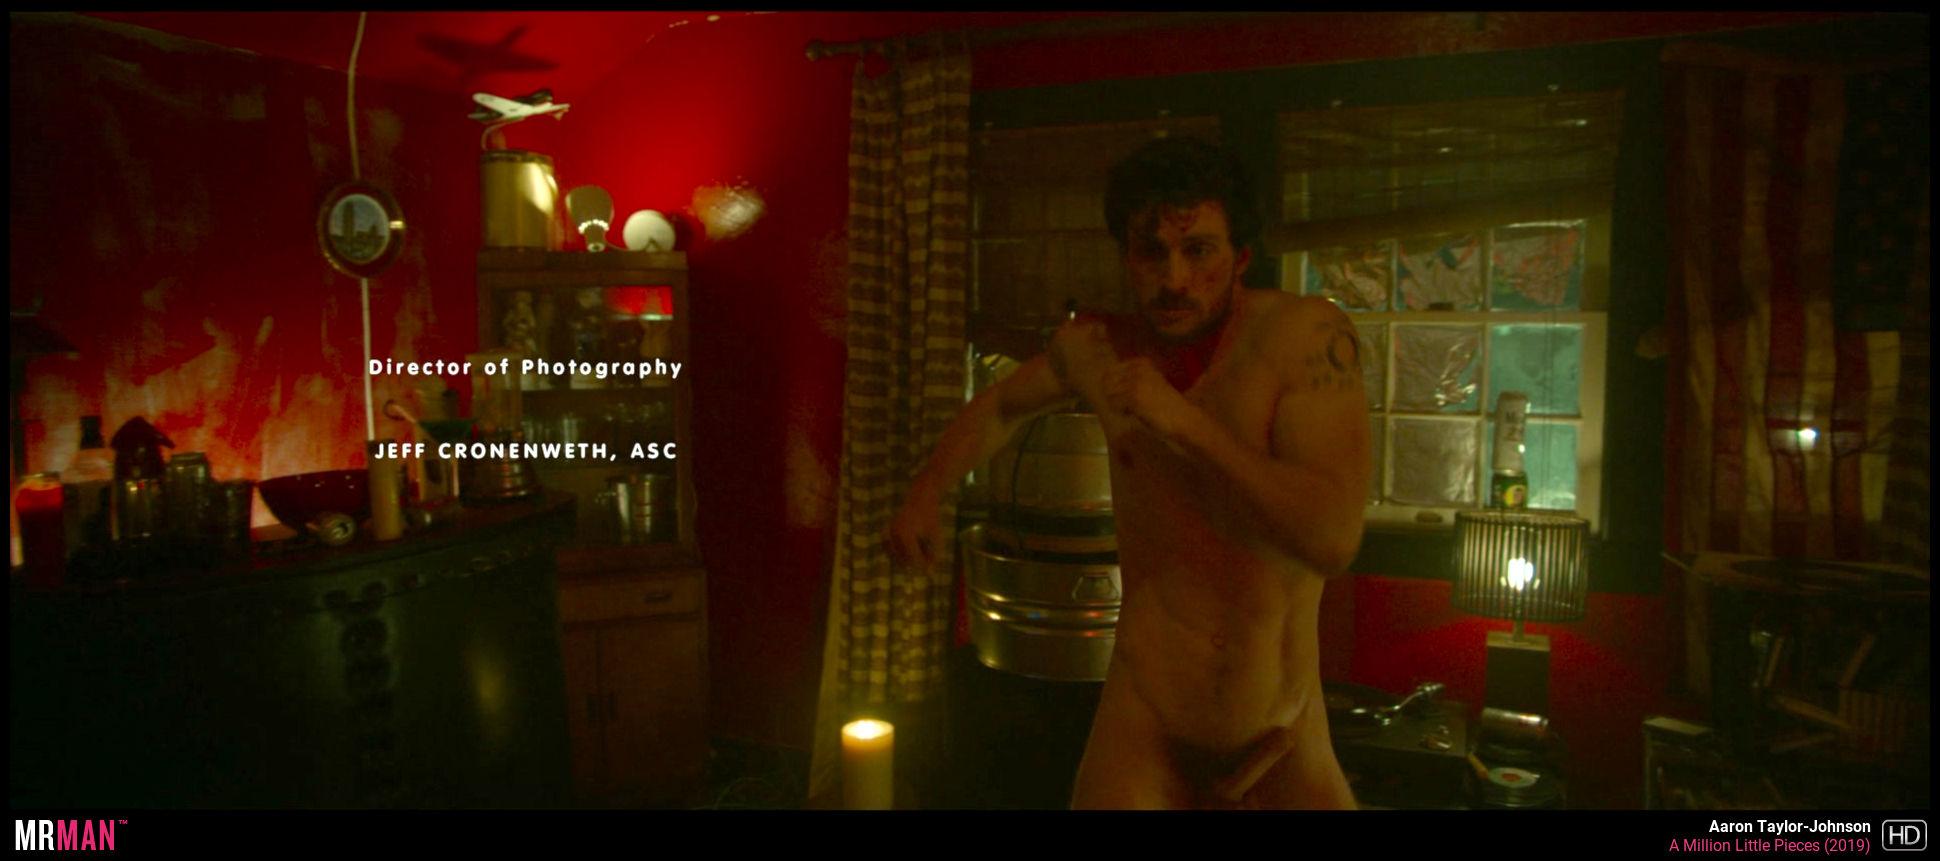 Naked aaron taylor-johnson ATJ is